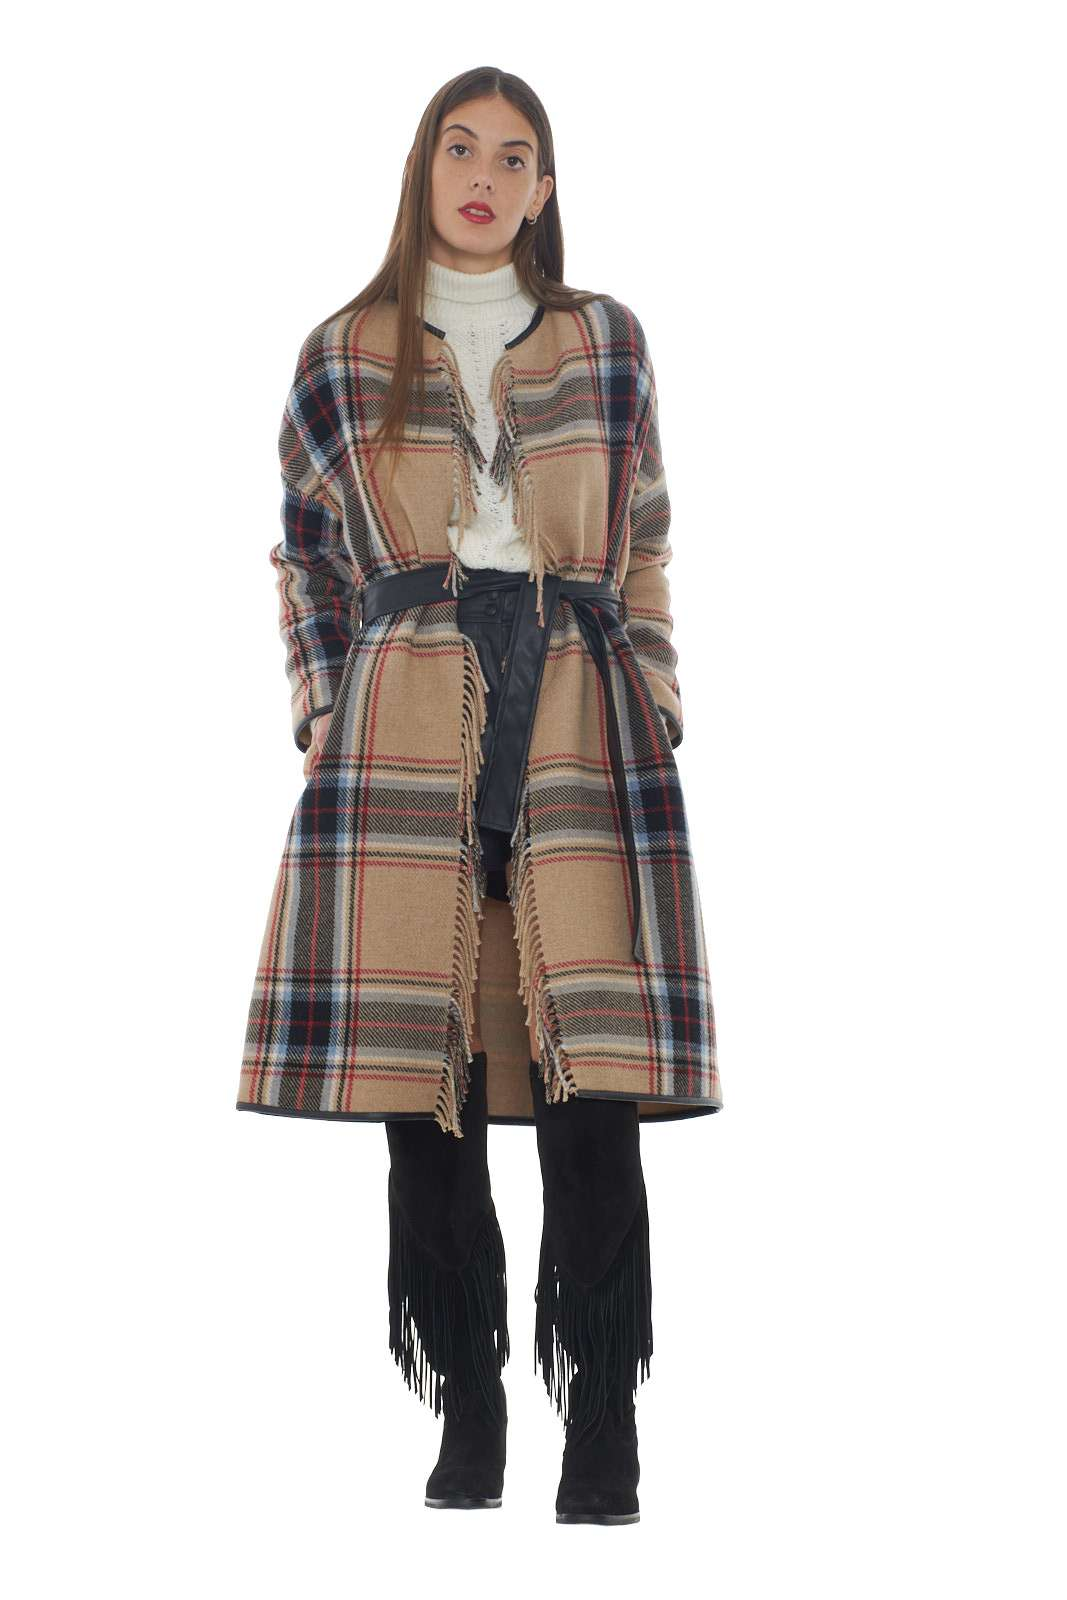 https://www.parmax.com/media/catalog/product/a/i/AI-outlet_parmax-cappotto-donna.Pinko-1G14HX-D.jpg